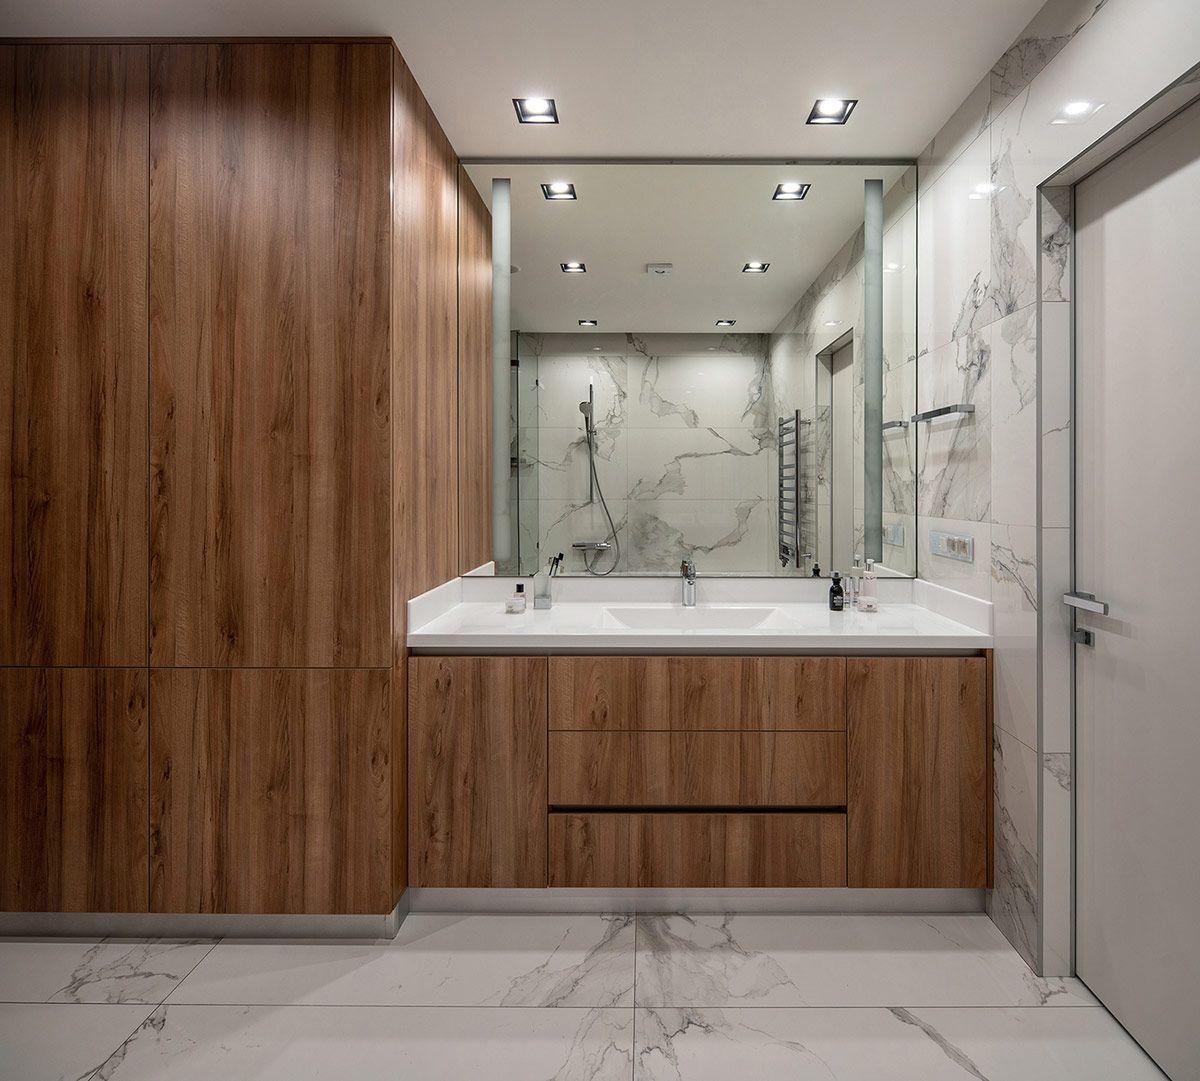 2 Apartments Under 120 Square Meters (1300 Square Feet ...